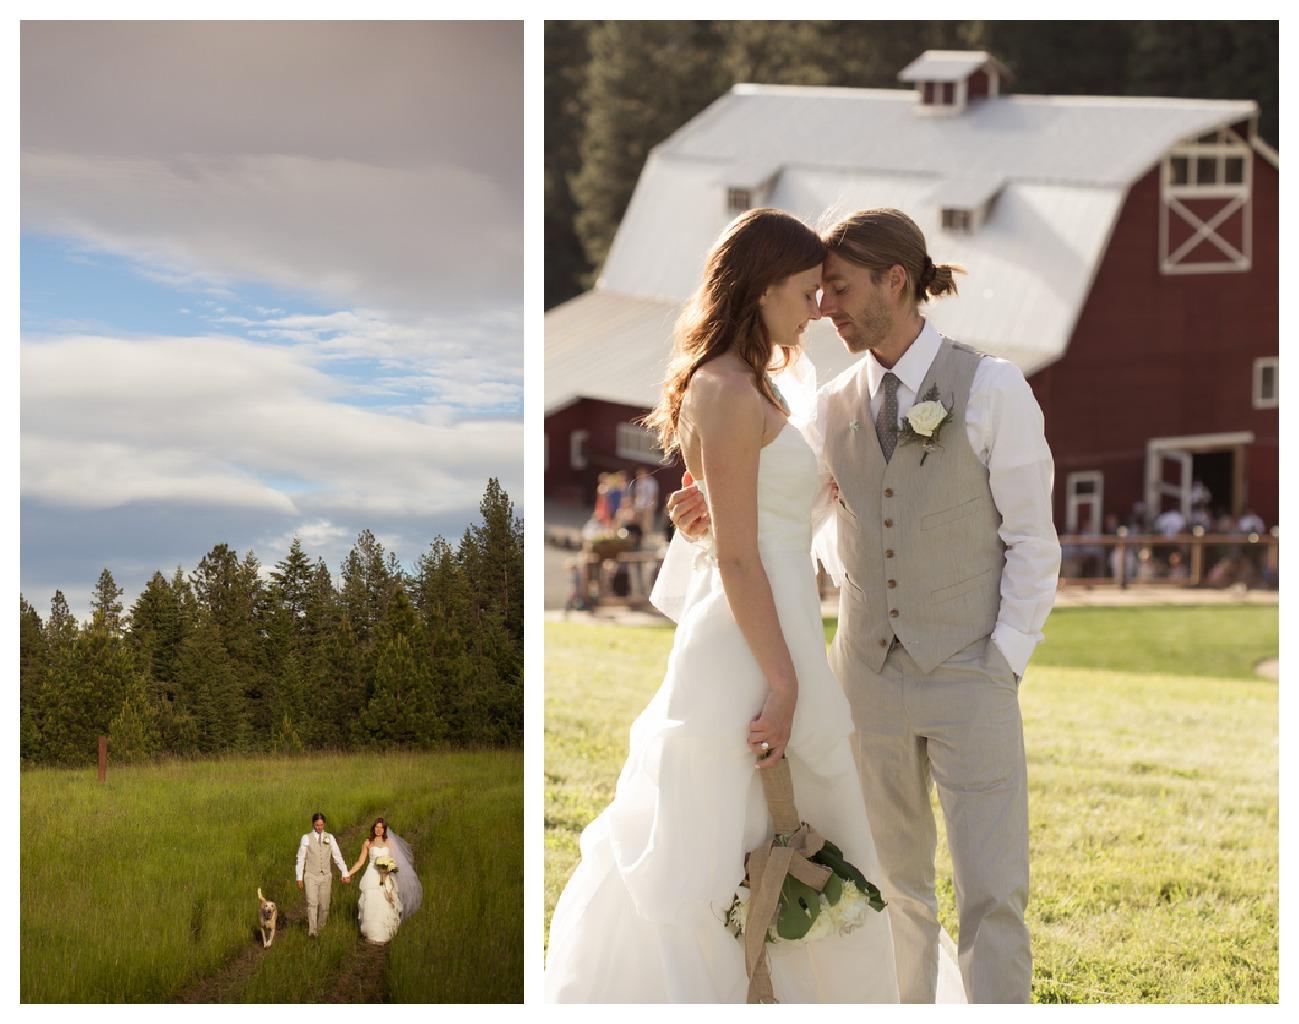 By Maggie Lord In Barn Weddings Real Rustic Country Weddings Top